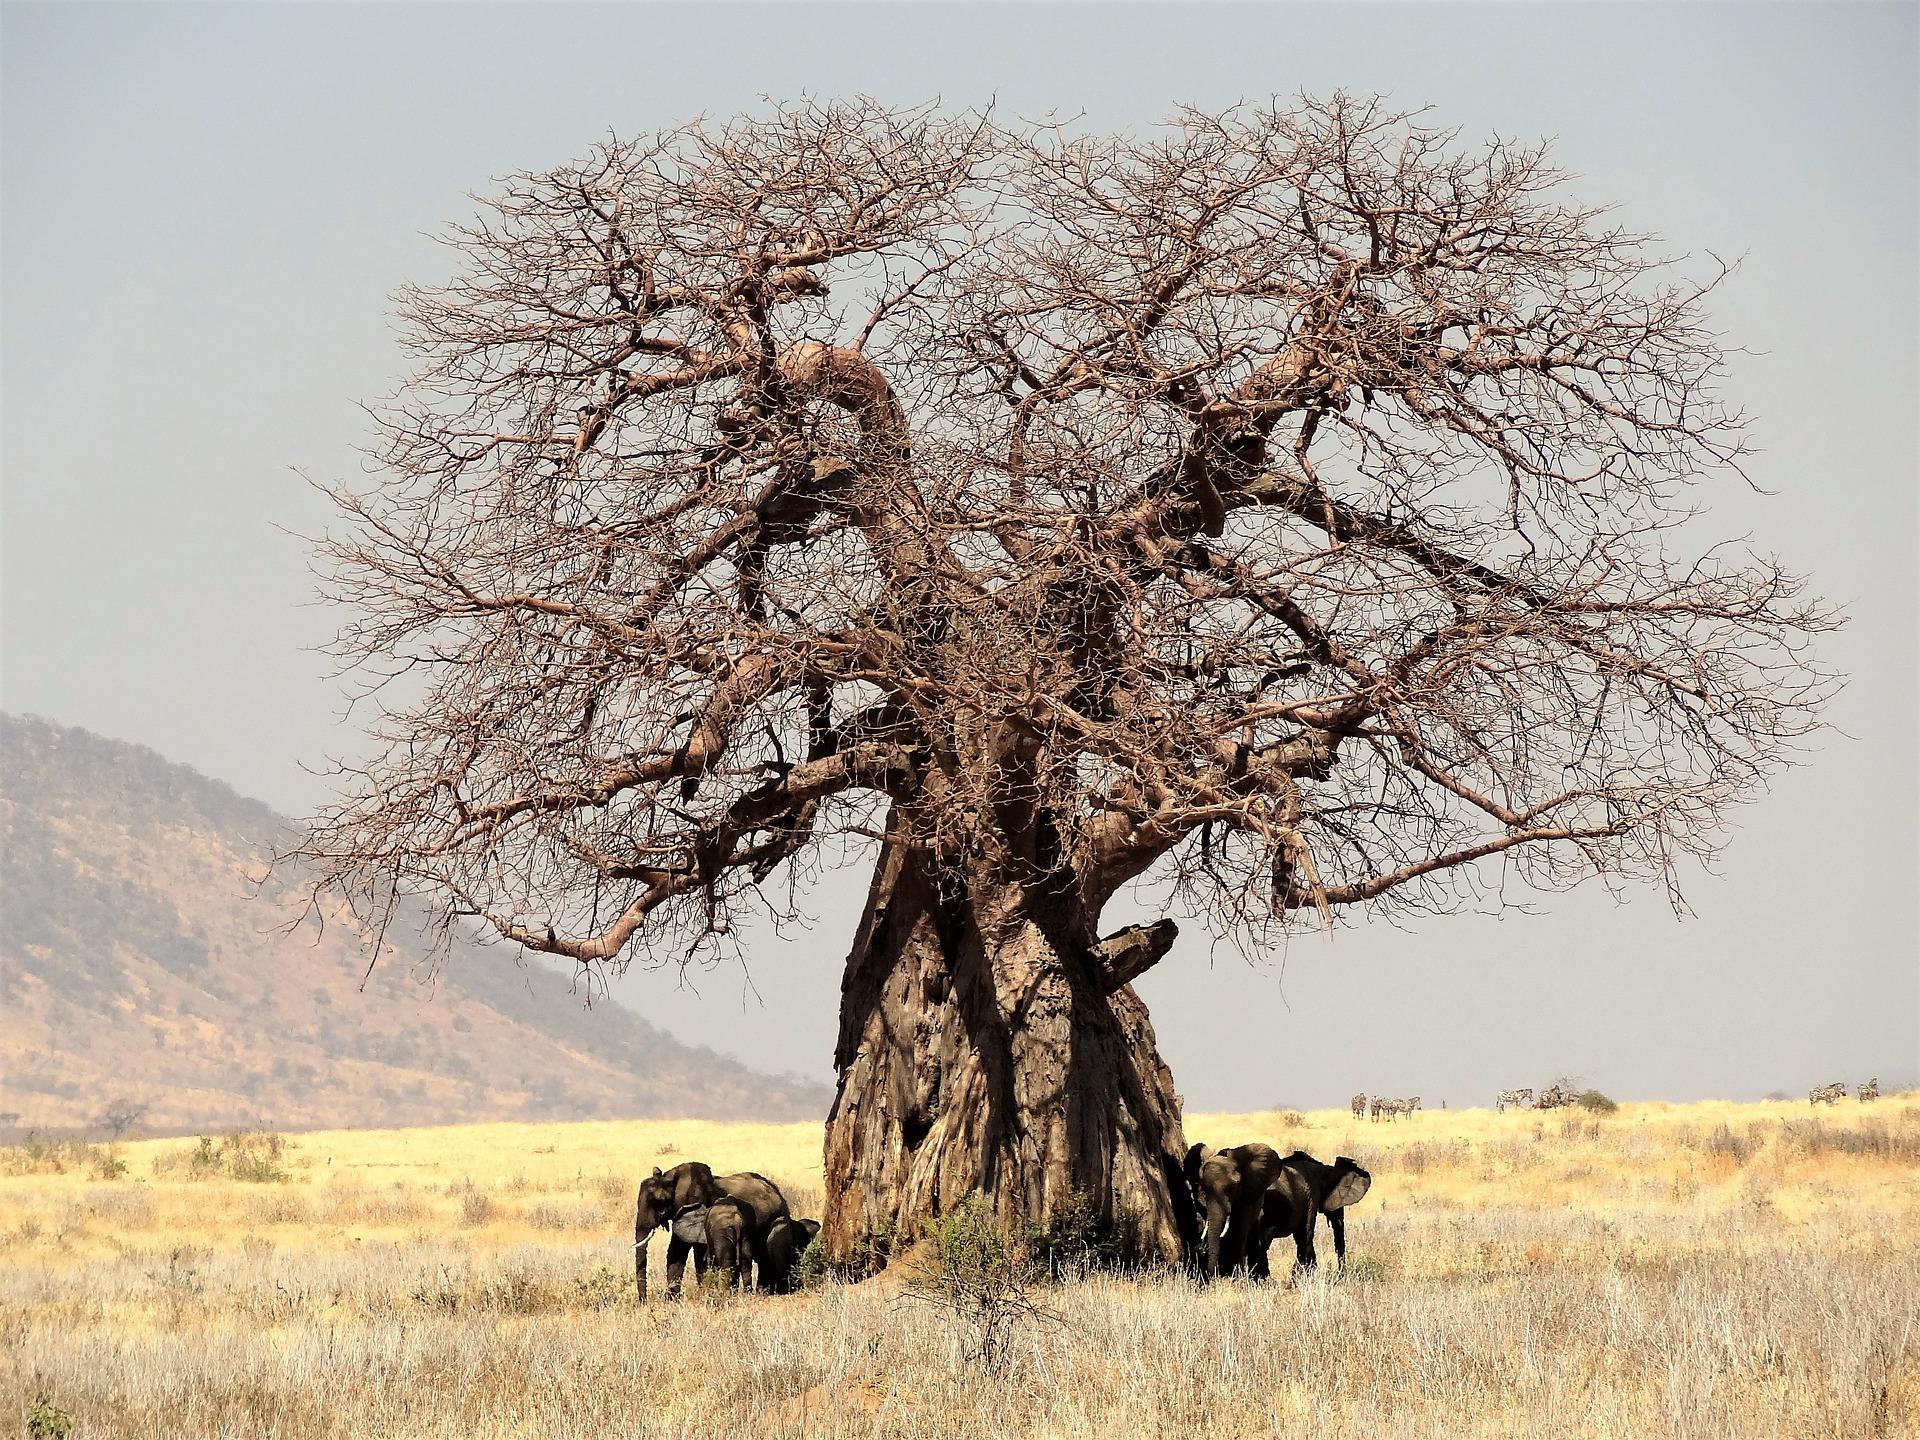 africa-1979226_1920.jpg